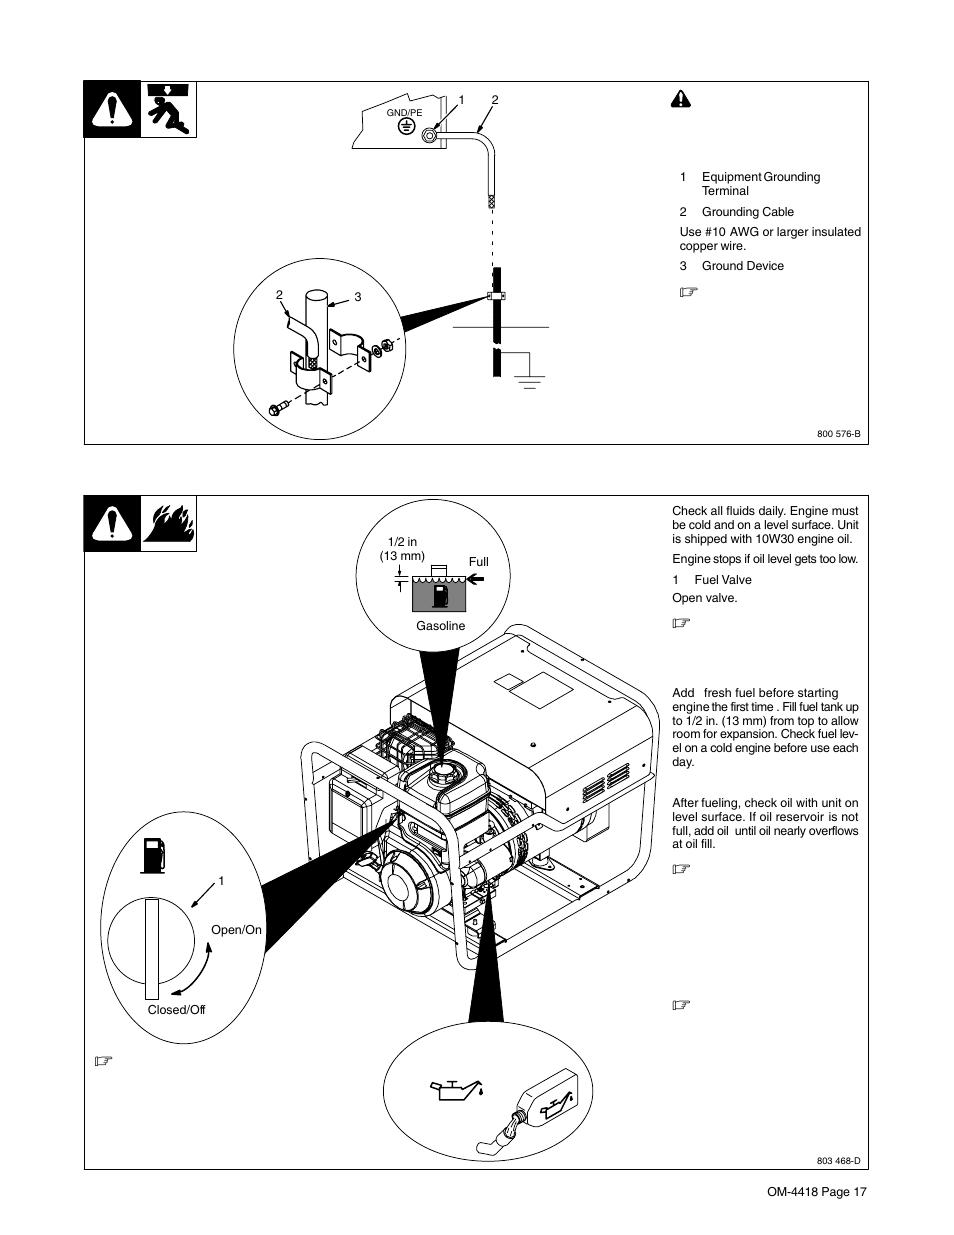 3 engine prestart checks hobart welding products ch ion 4500 om rh manualsdir 220 3 phase wiring diagram millermatic 200 wiring diagram